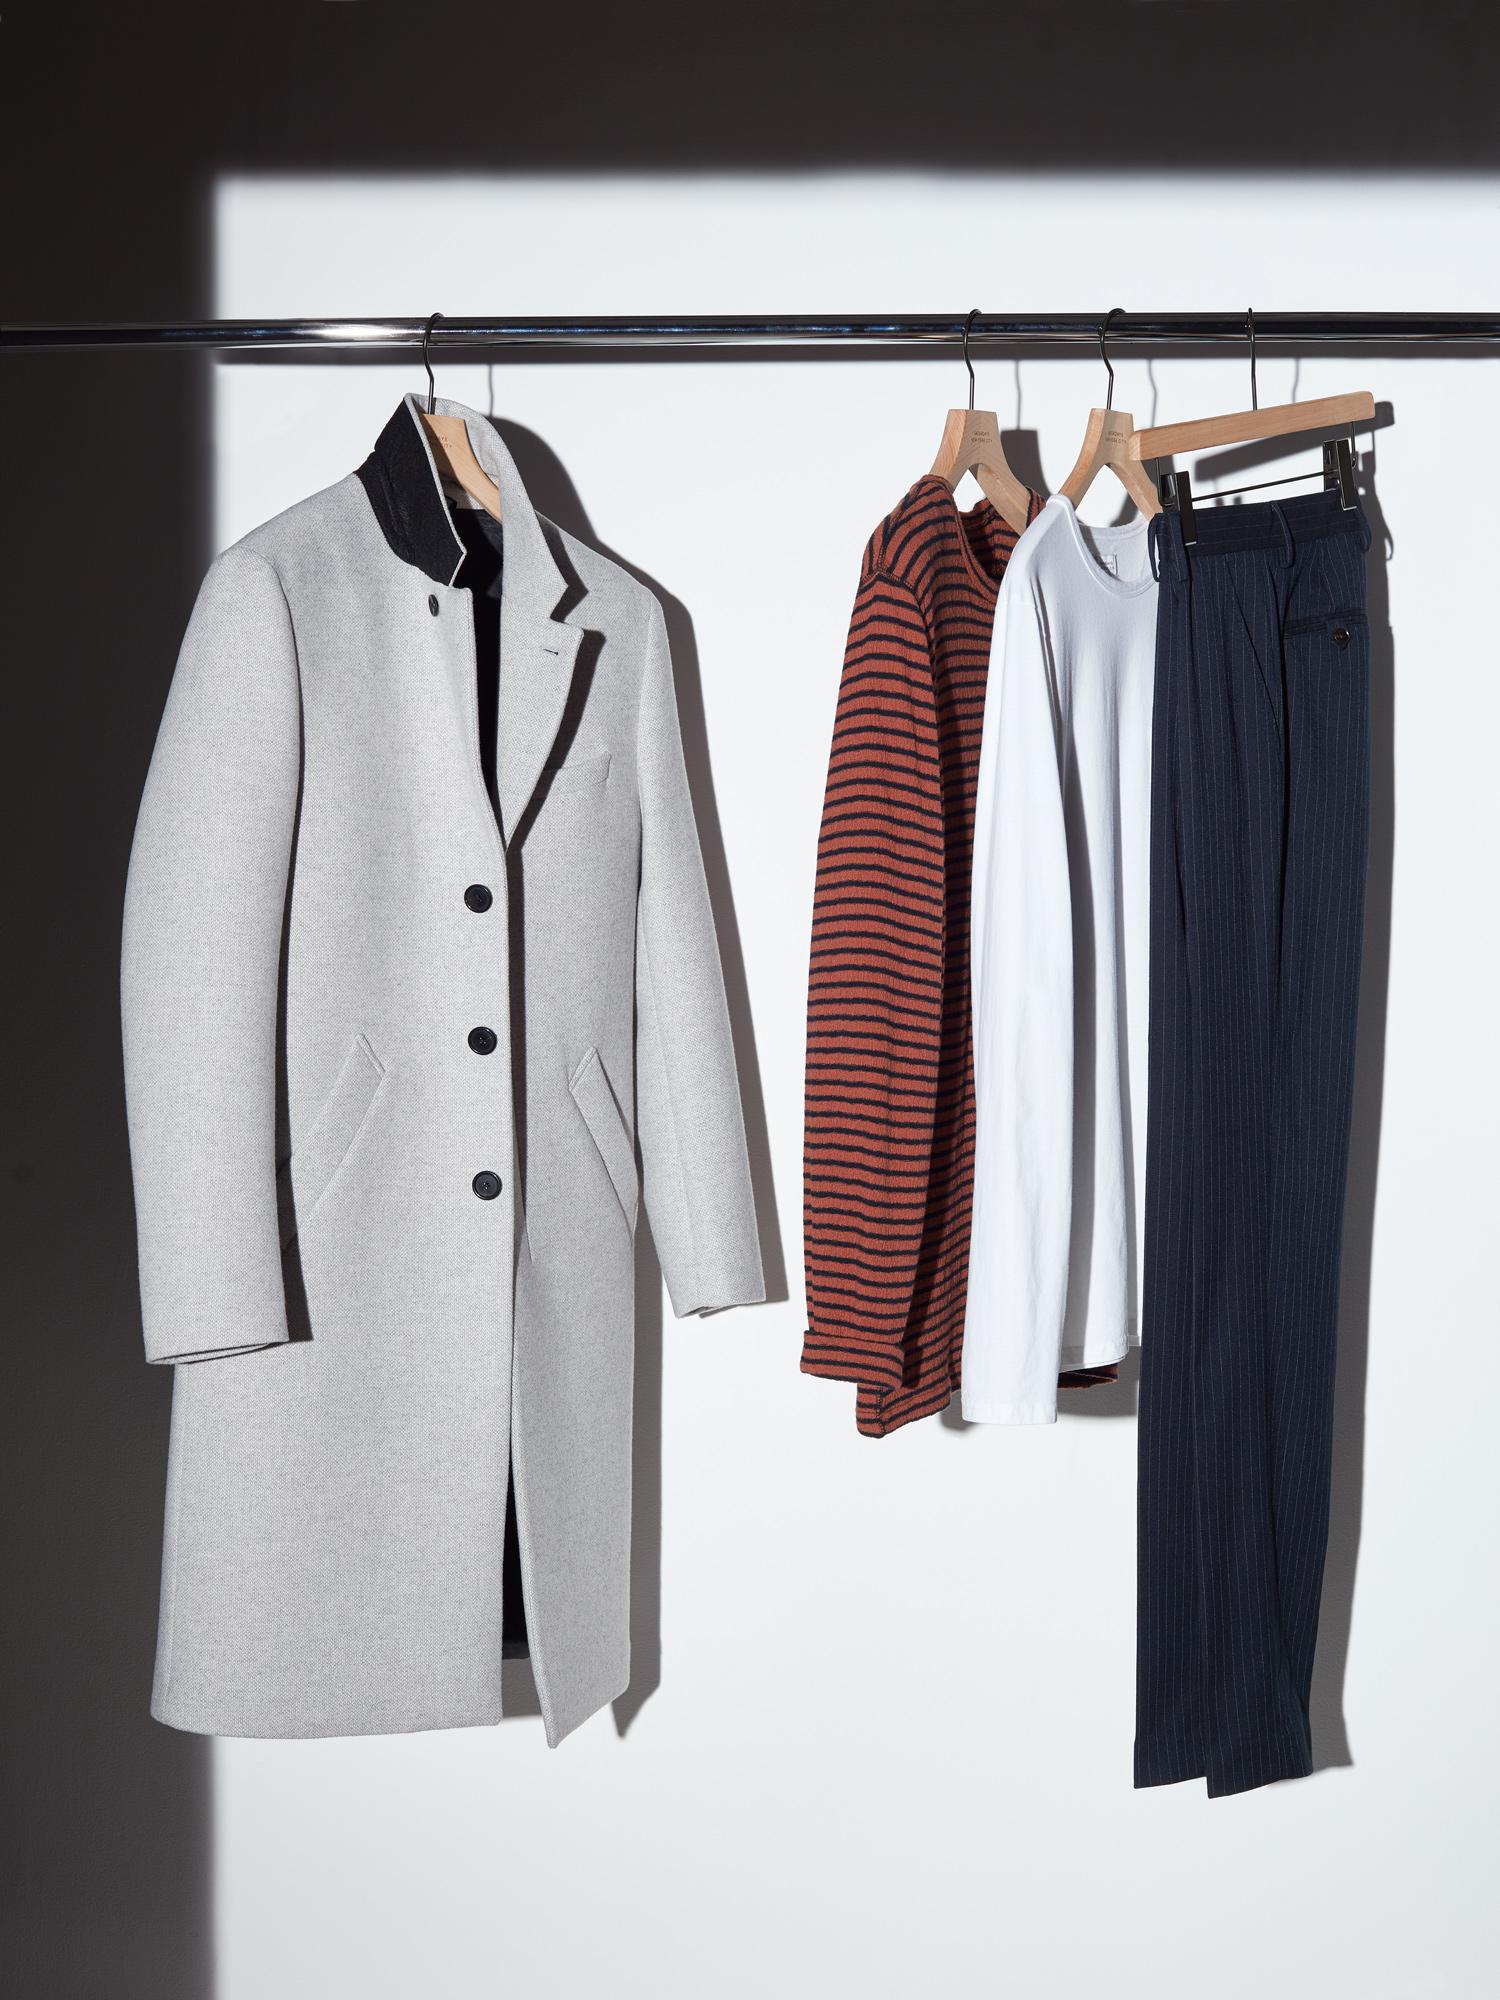 The Morgan Wool Coat, Alek Stripe Long Sleeve Shirt, James Pima Long Sleeve Shirt, and Panos Stripe Trousers.